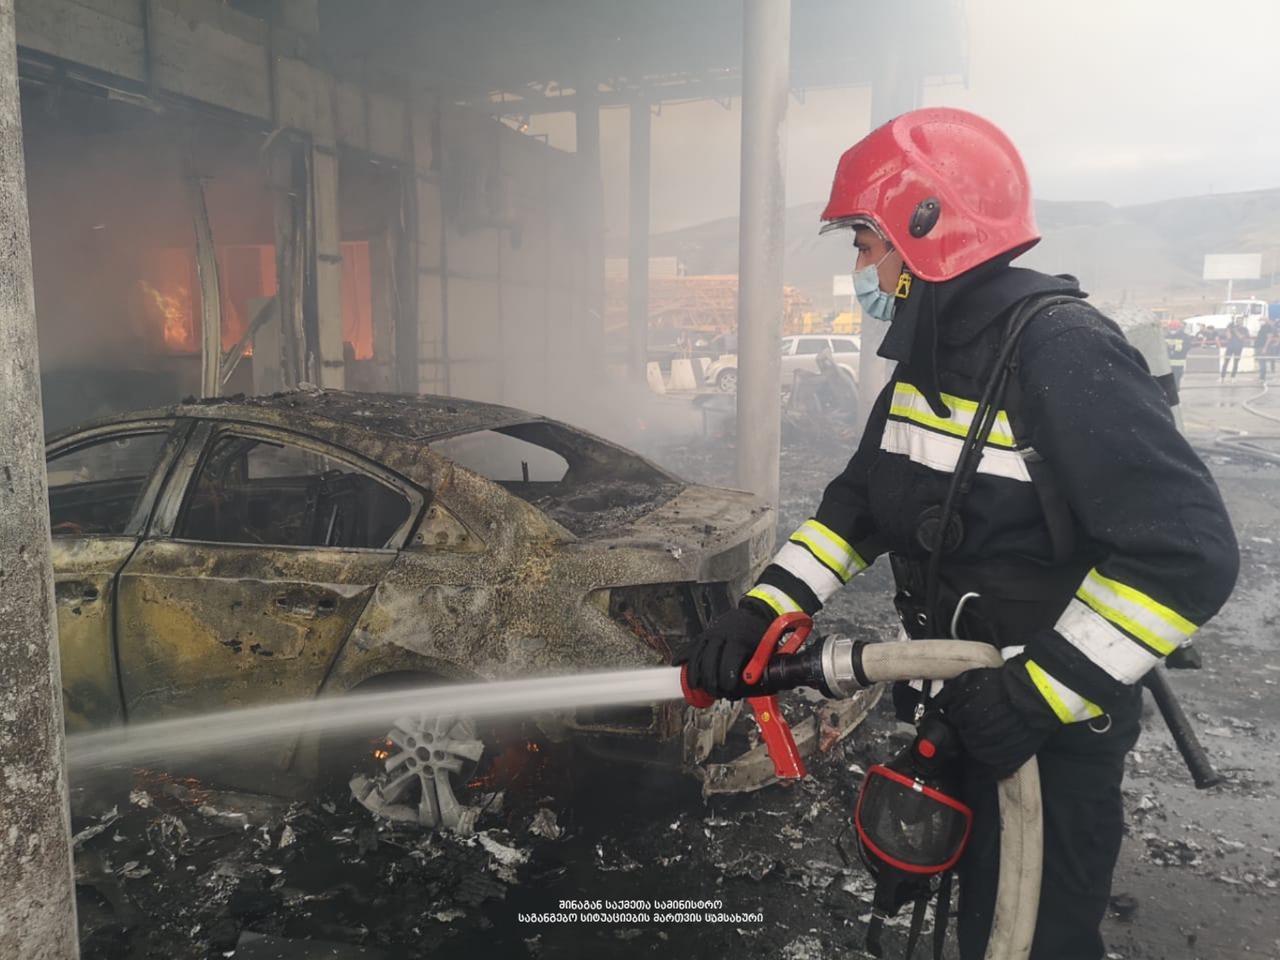 197788253 2583246391979577 7729503618735814249 n #новости авторынок Рустави, пожар